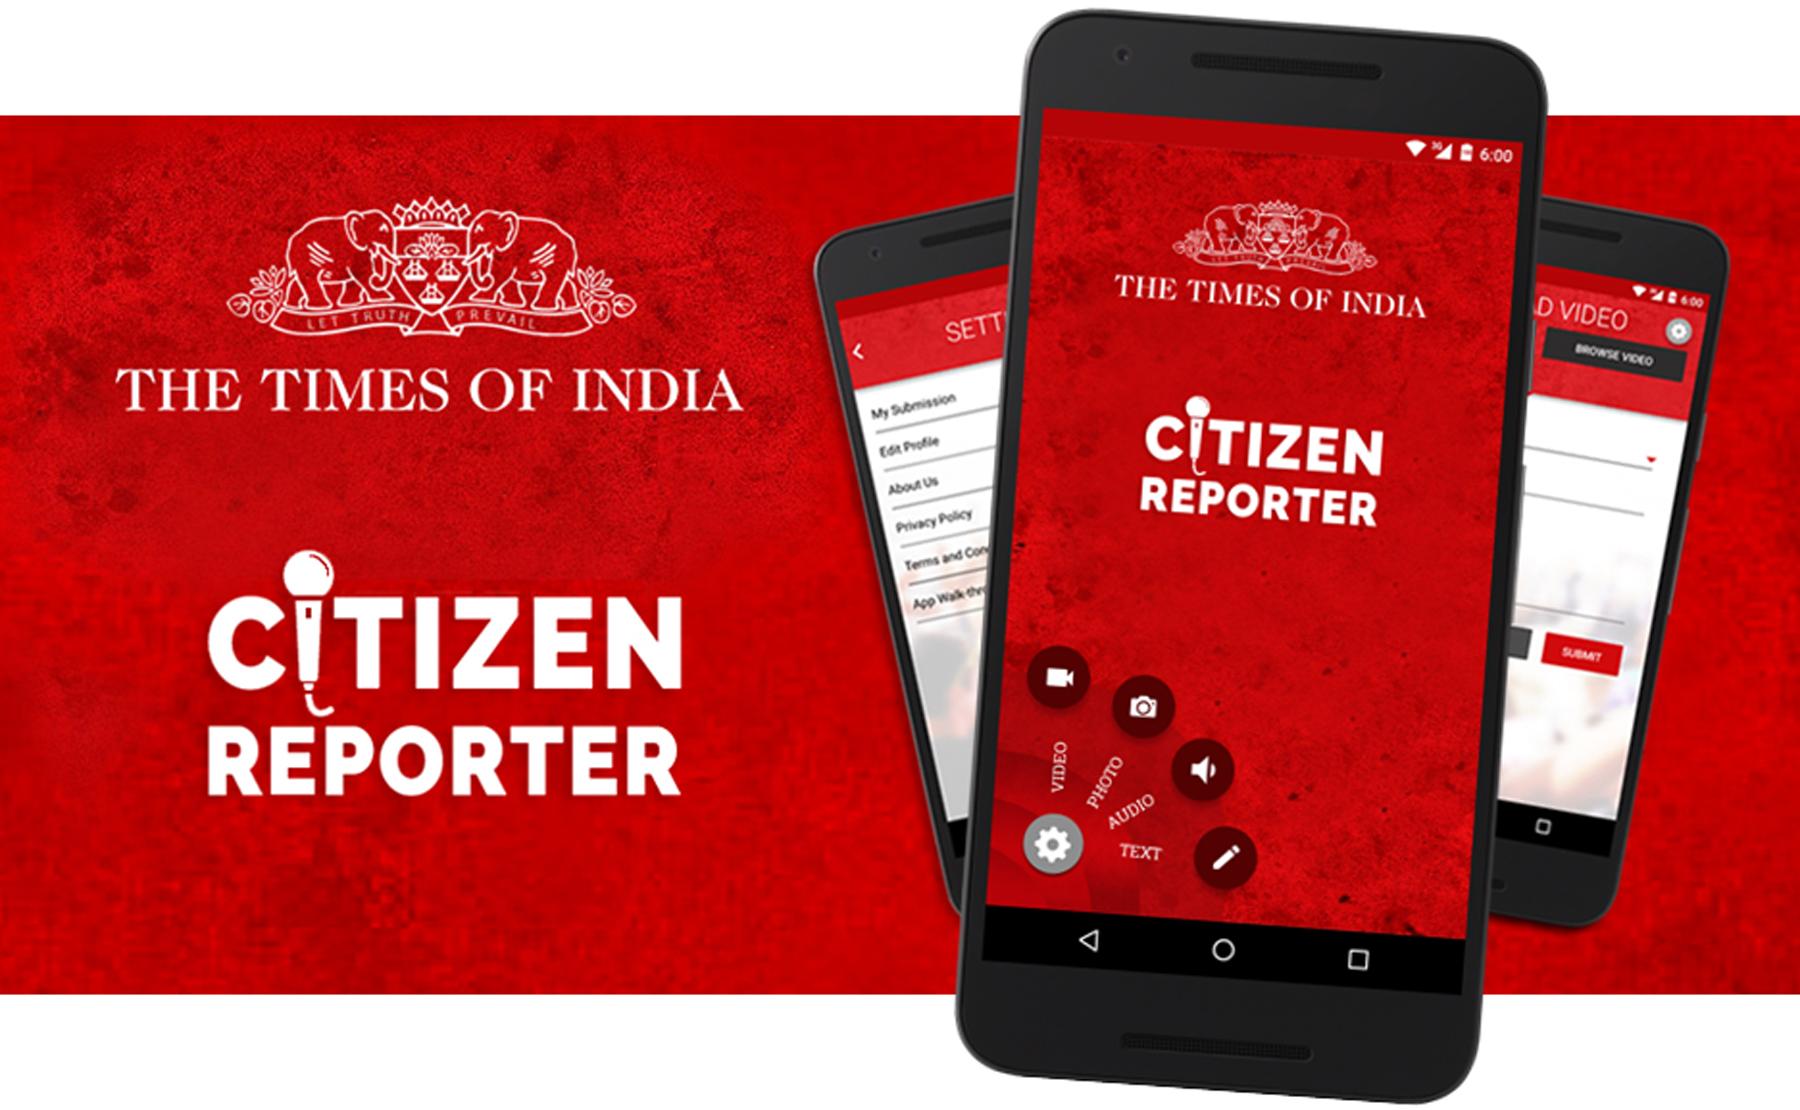 Citizen Reporter App - Times of India, Maharashtra Times, Navbharat Times